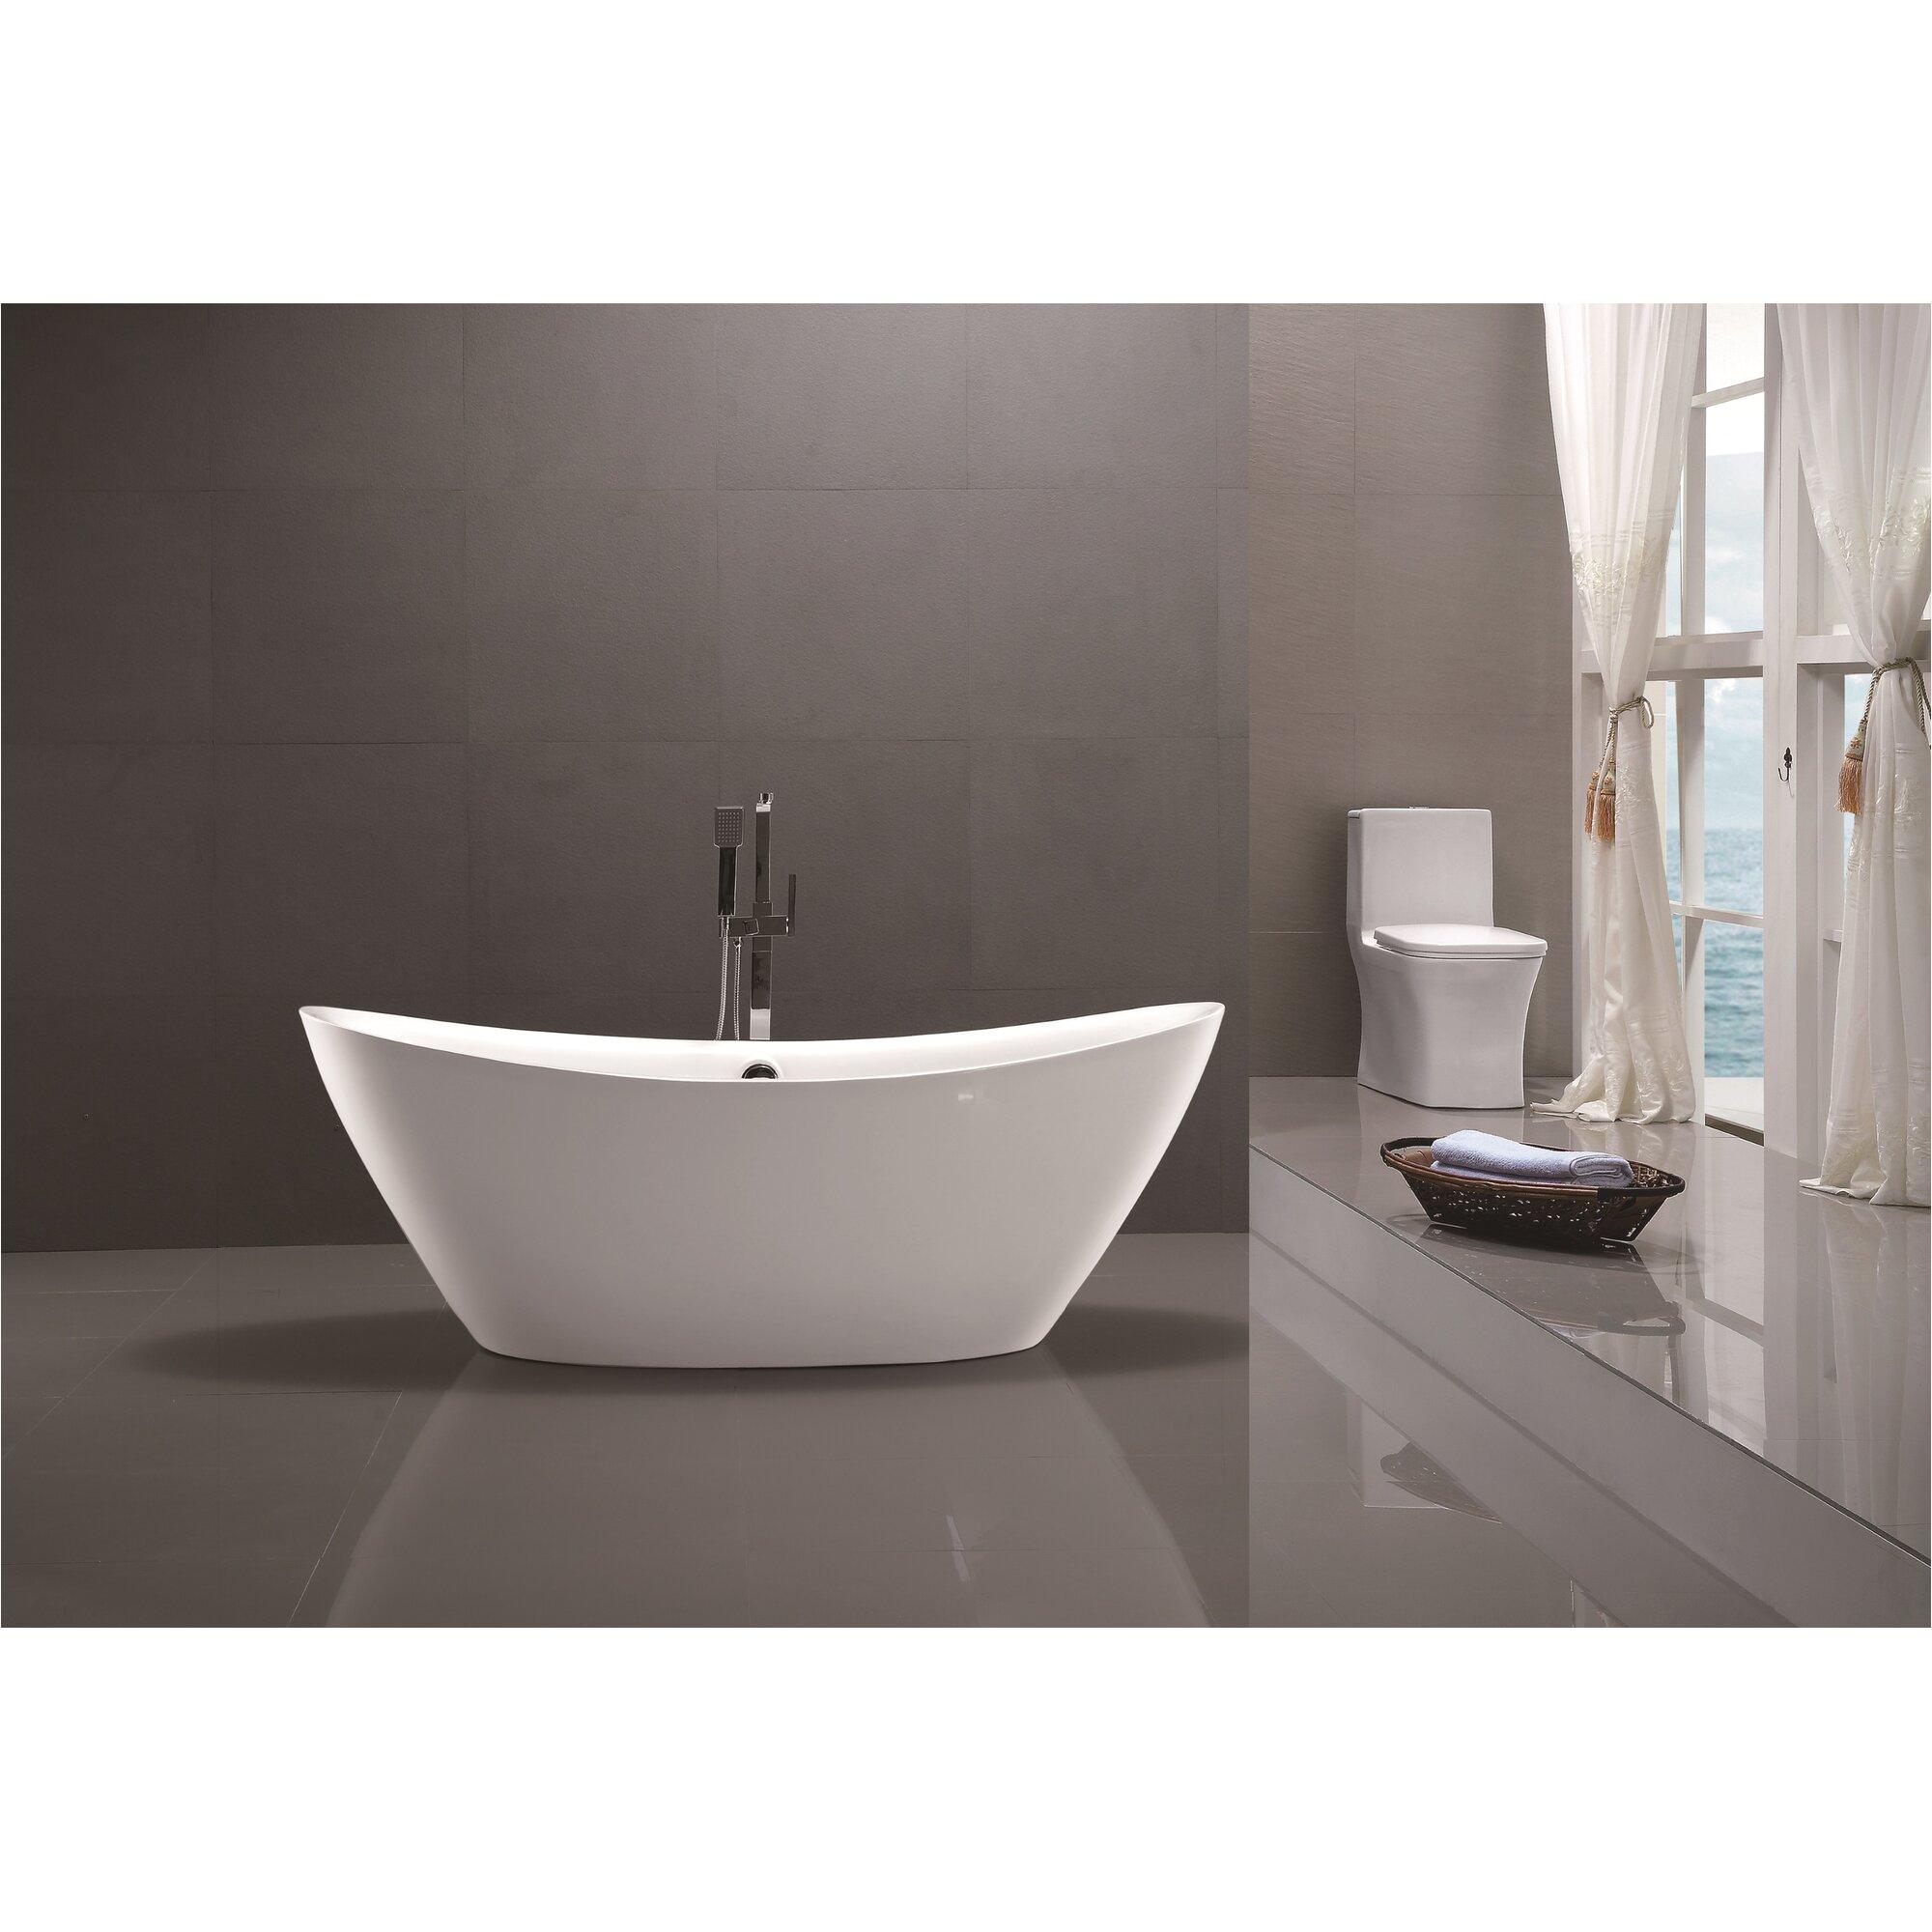 Vanity Art 71 x 34 Freestanding Soaking Bathtub VNAR1024